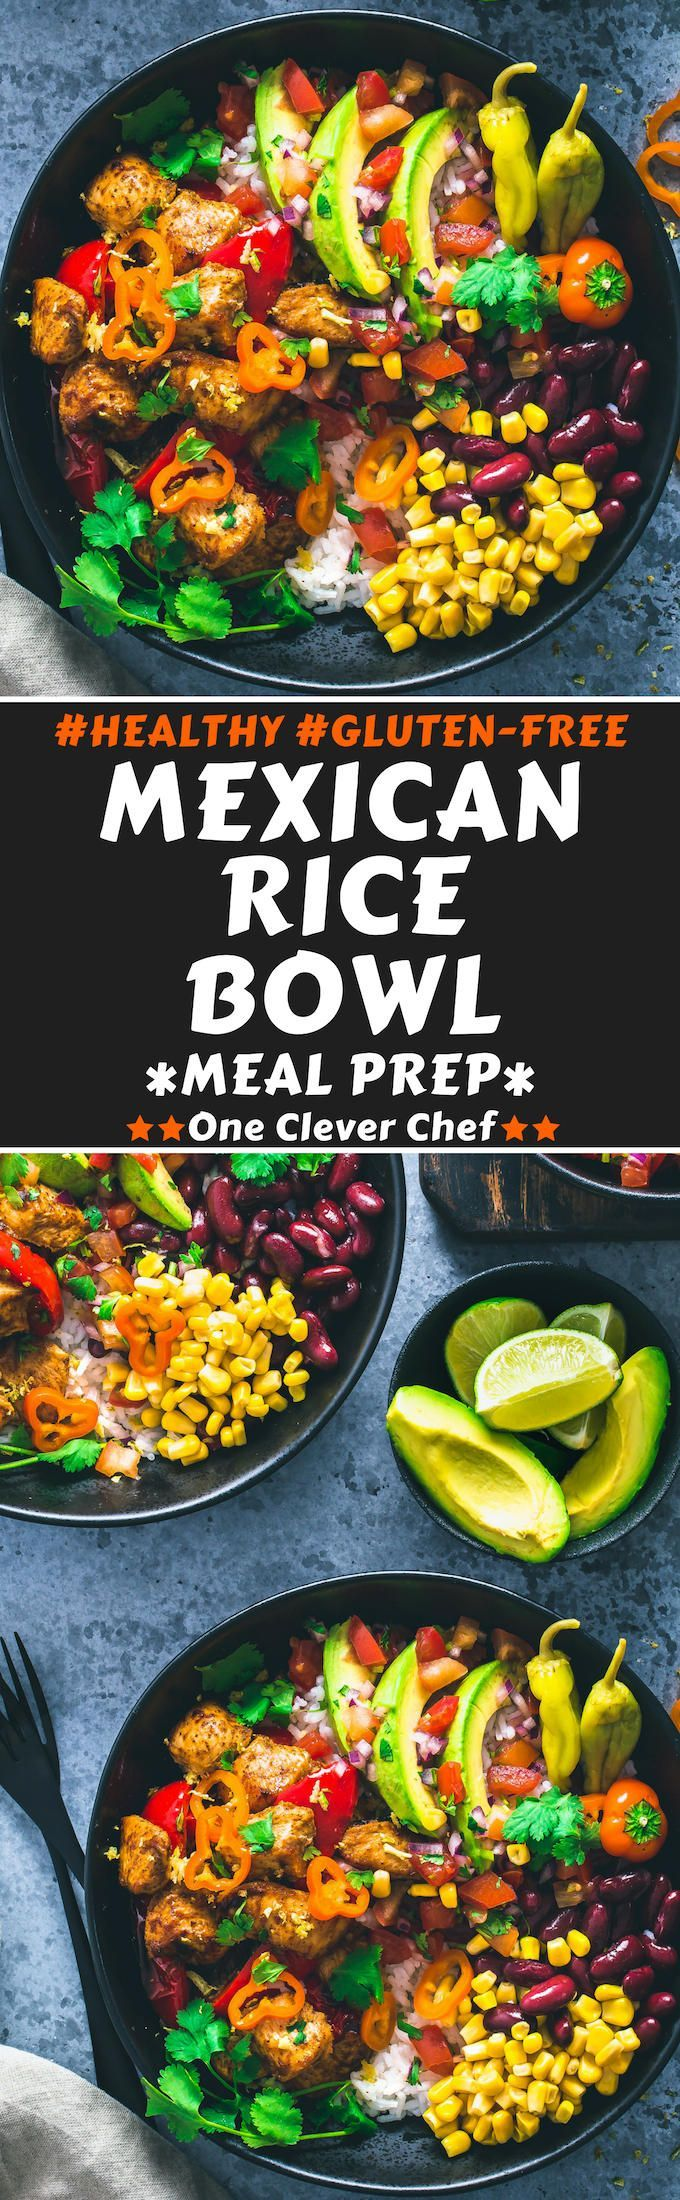 Mexican Meal Prep Meme